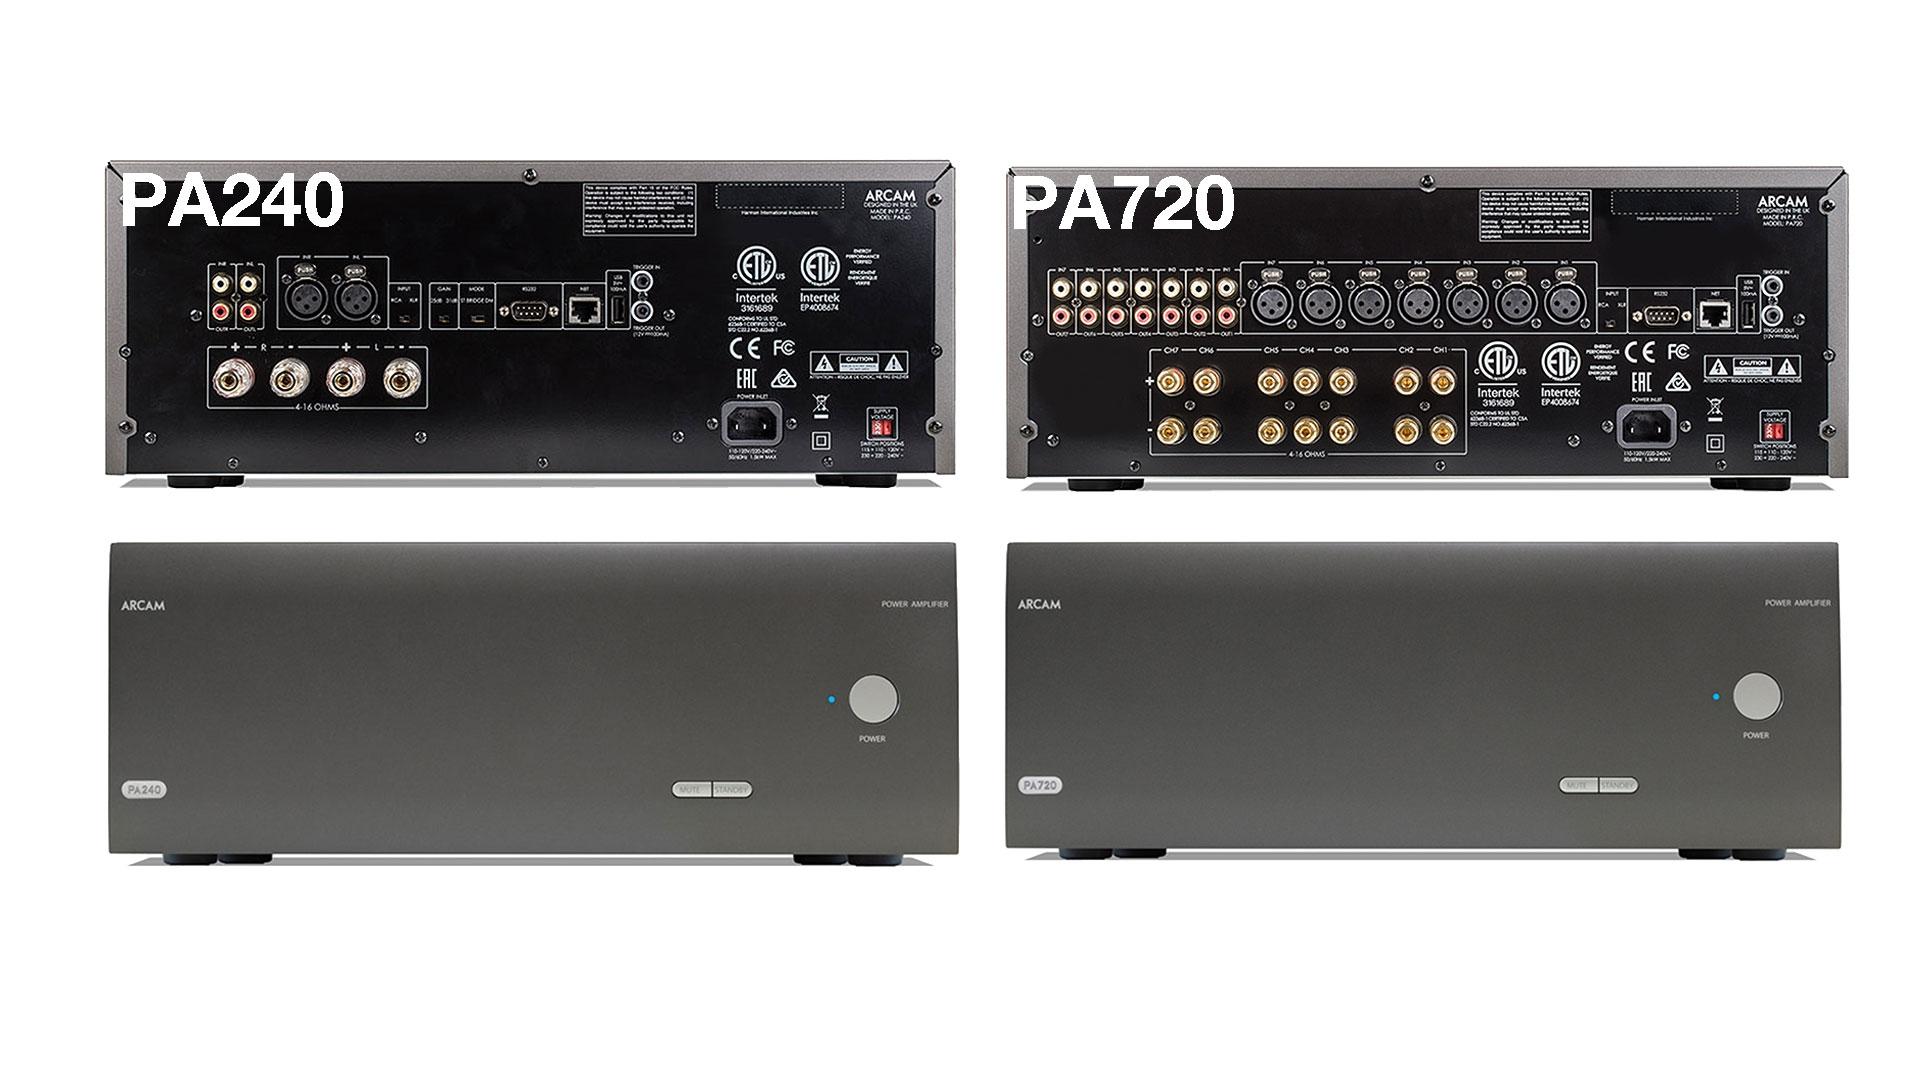 New Arcam Power Amplifiers | Unilet Sound & Vision